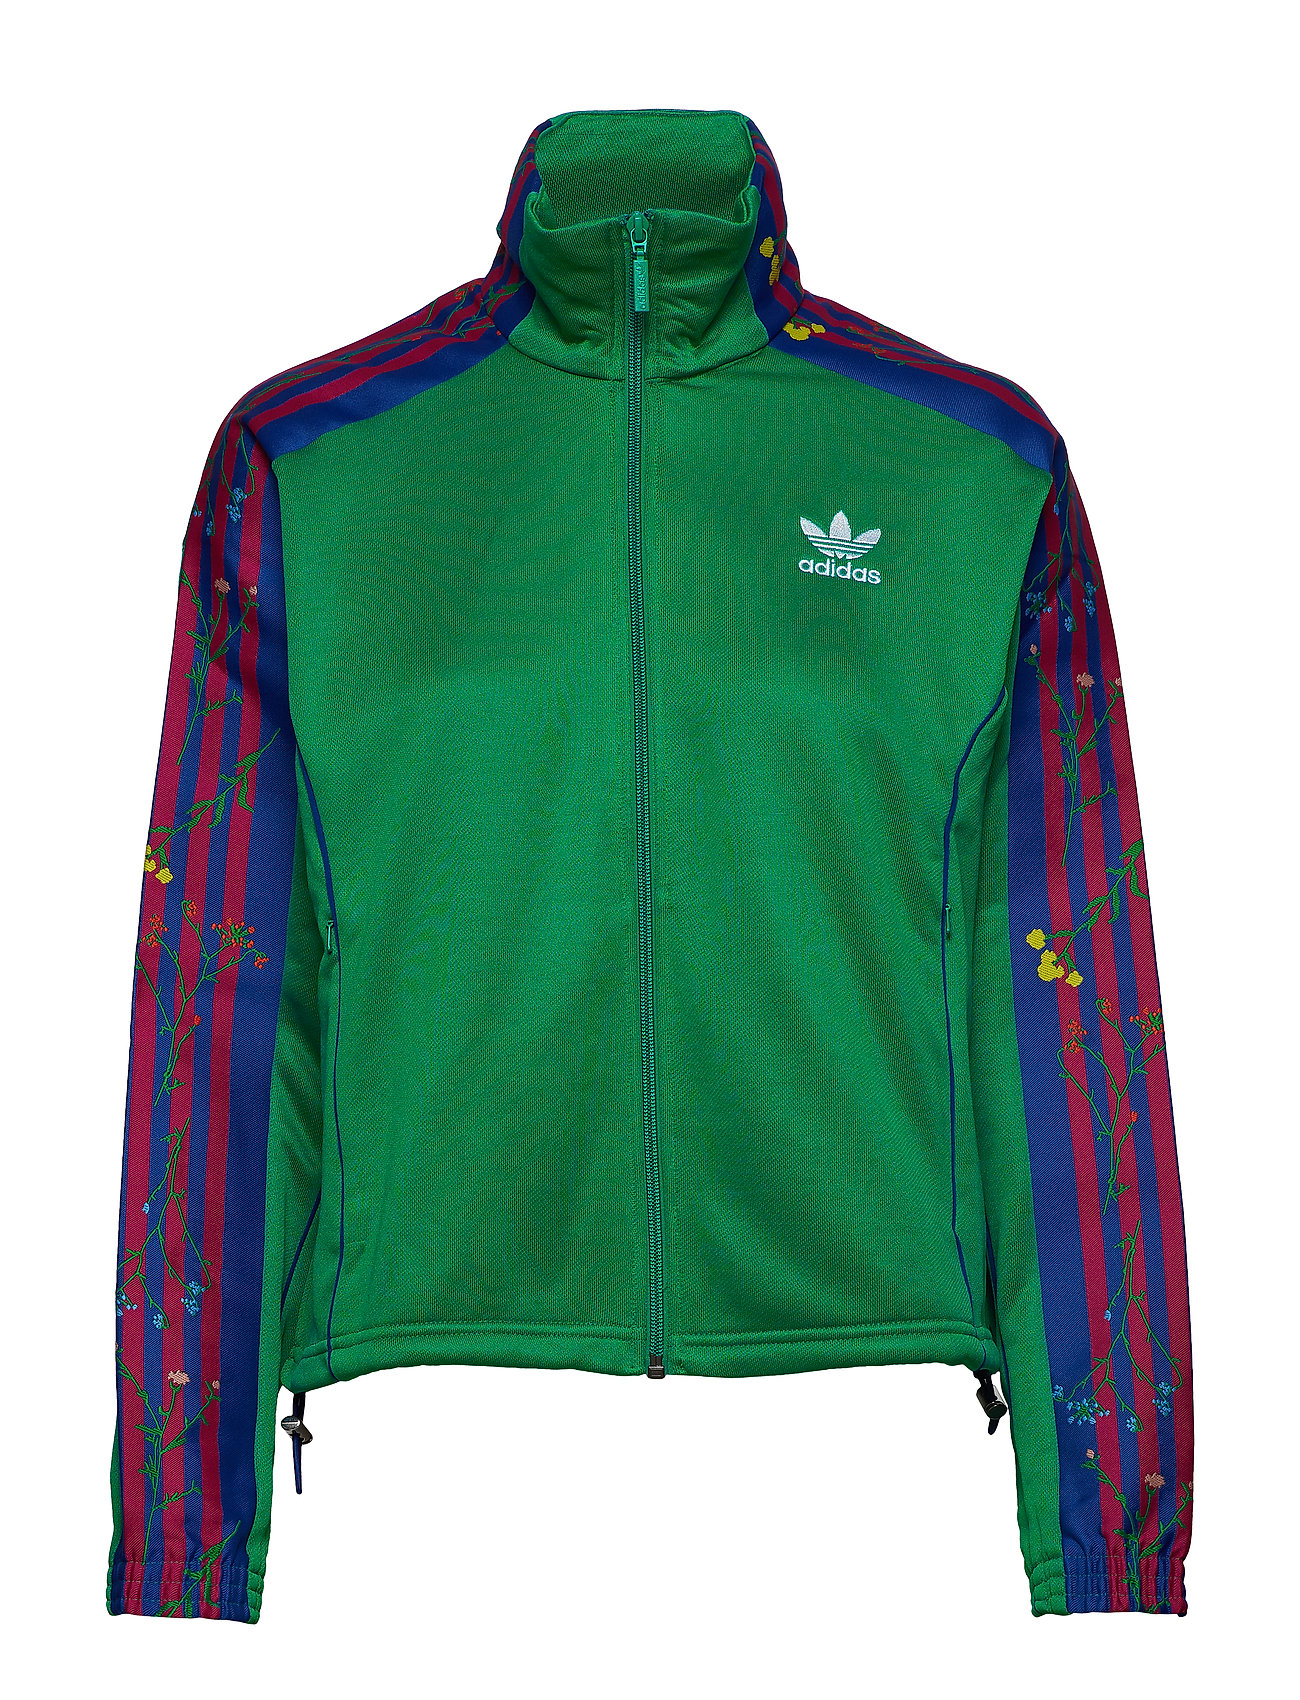 ADIDAS Tracktop Sweat-shirt Pullover Grün ADIDAS ORIGINALS